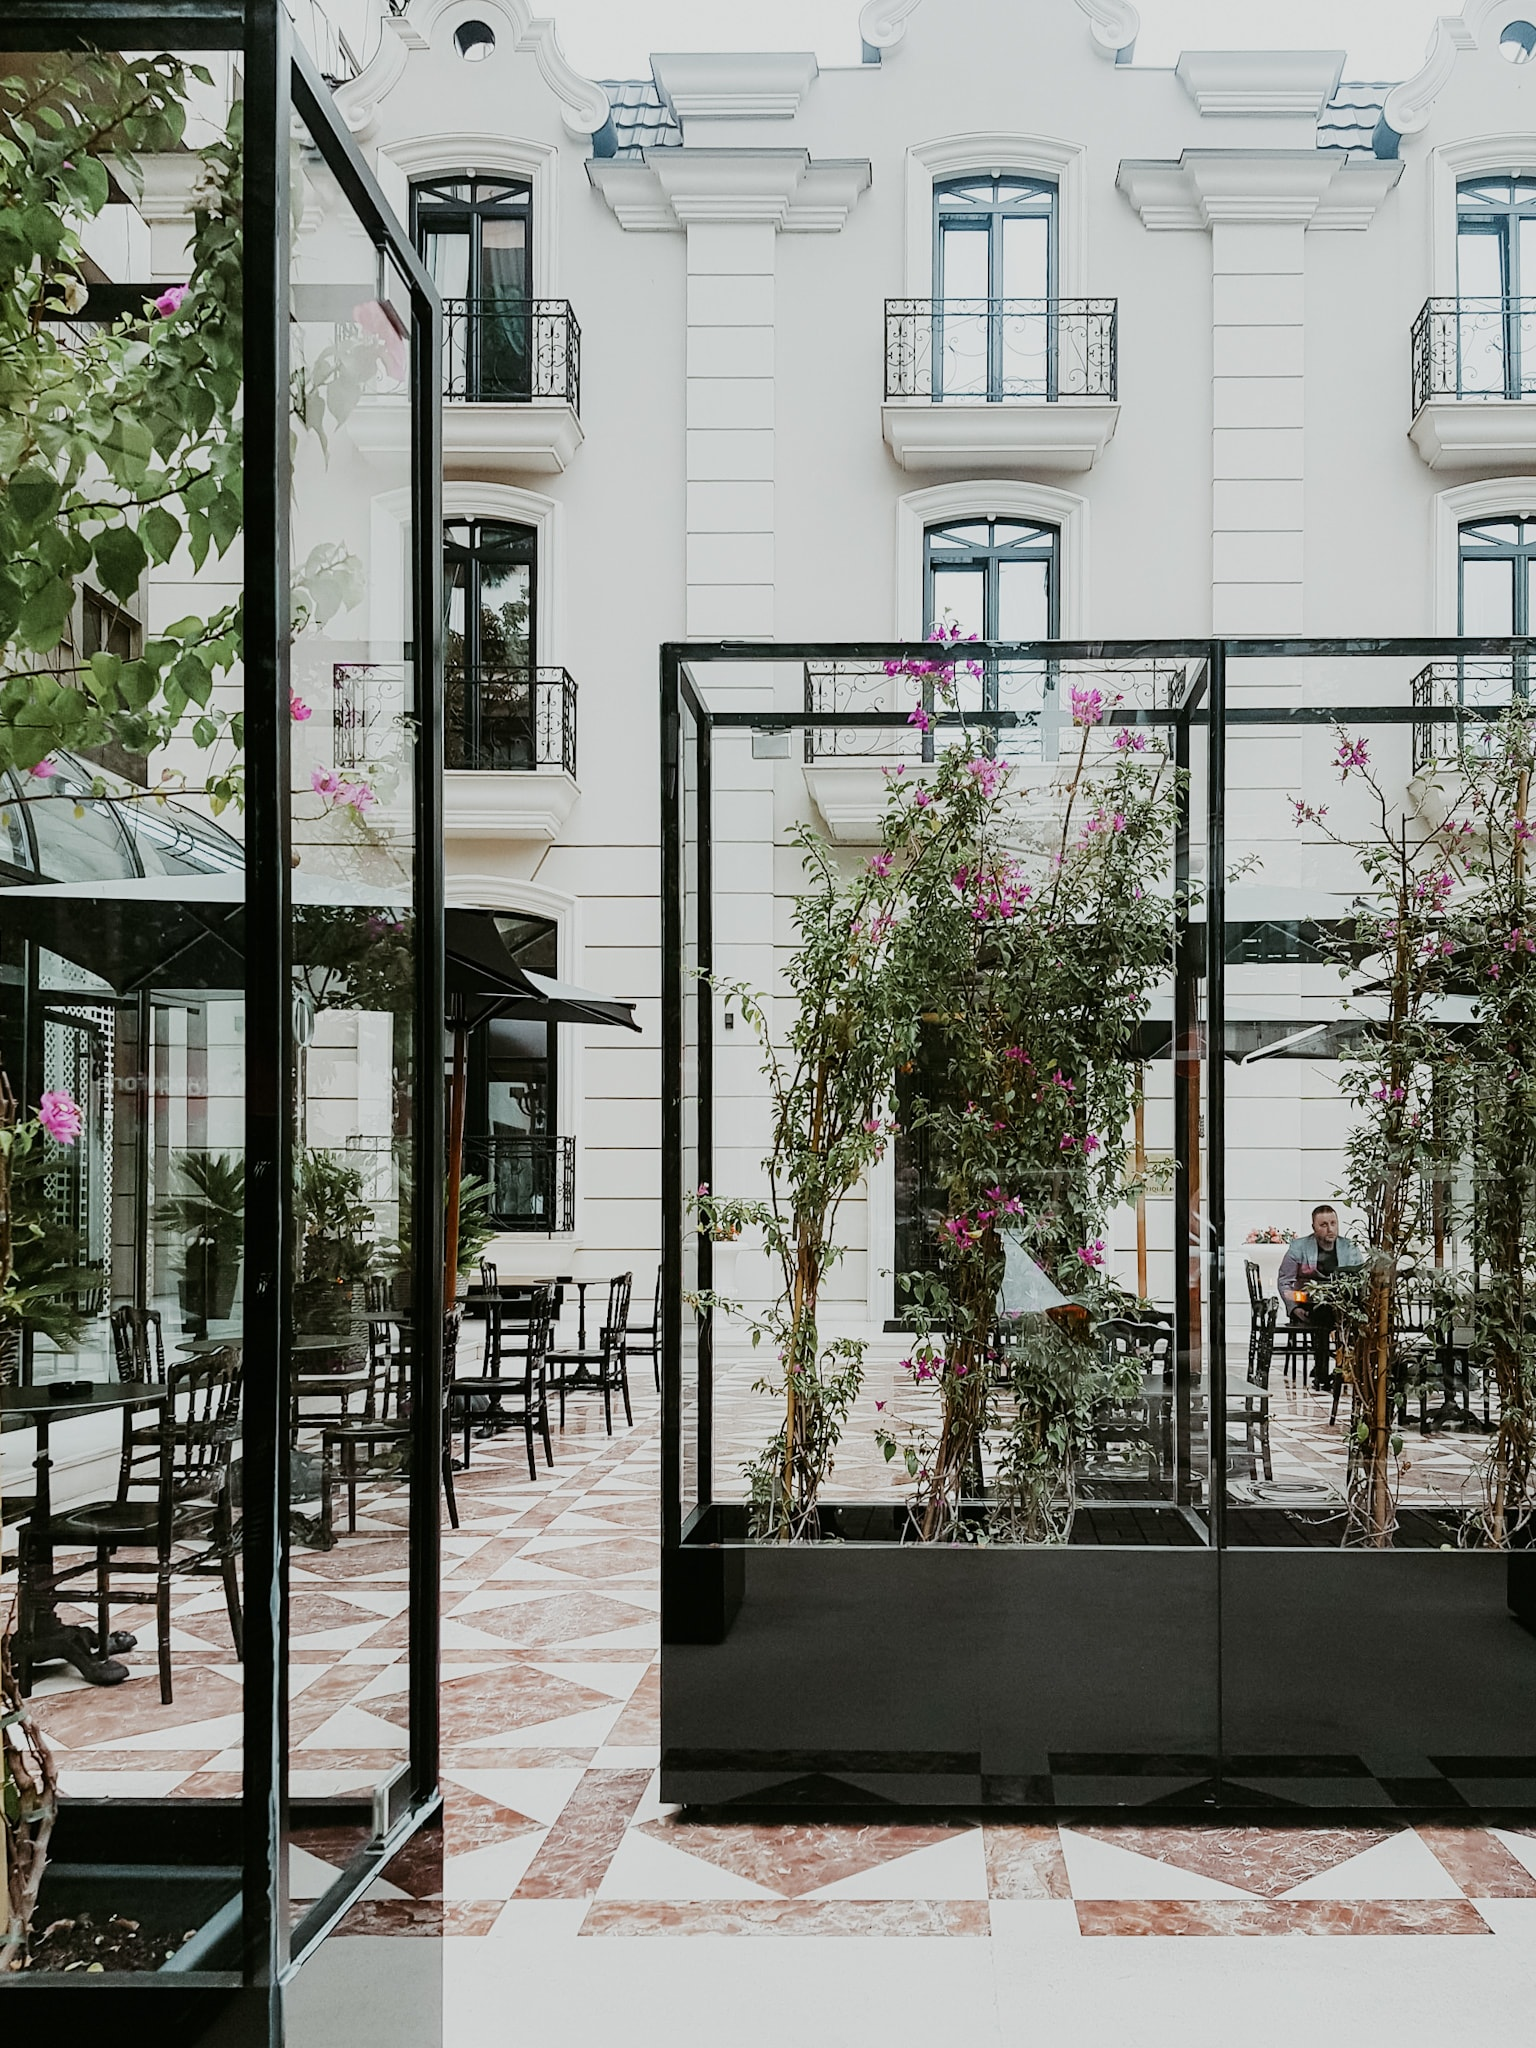 Tirana Arte Cafe Blloku